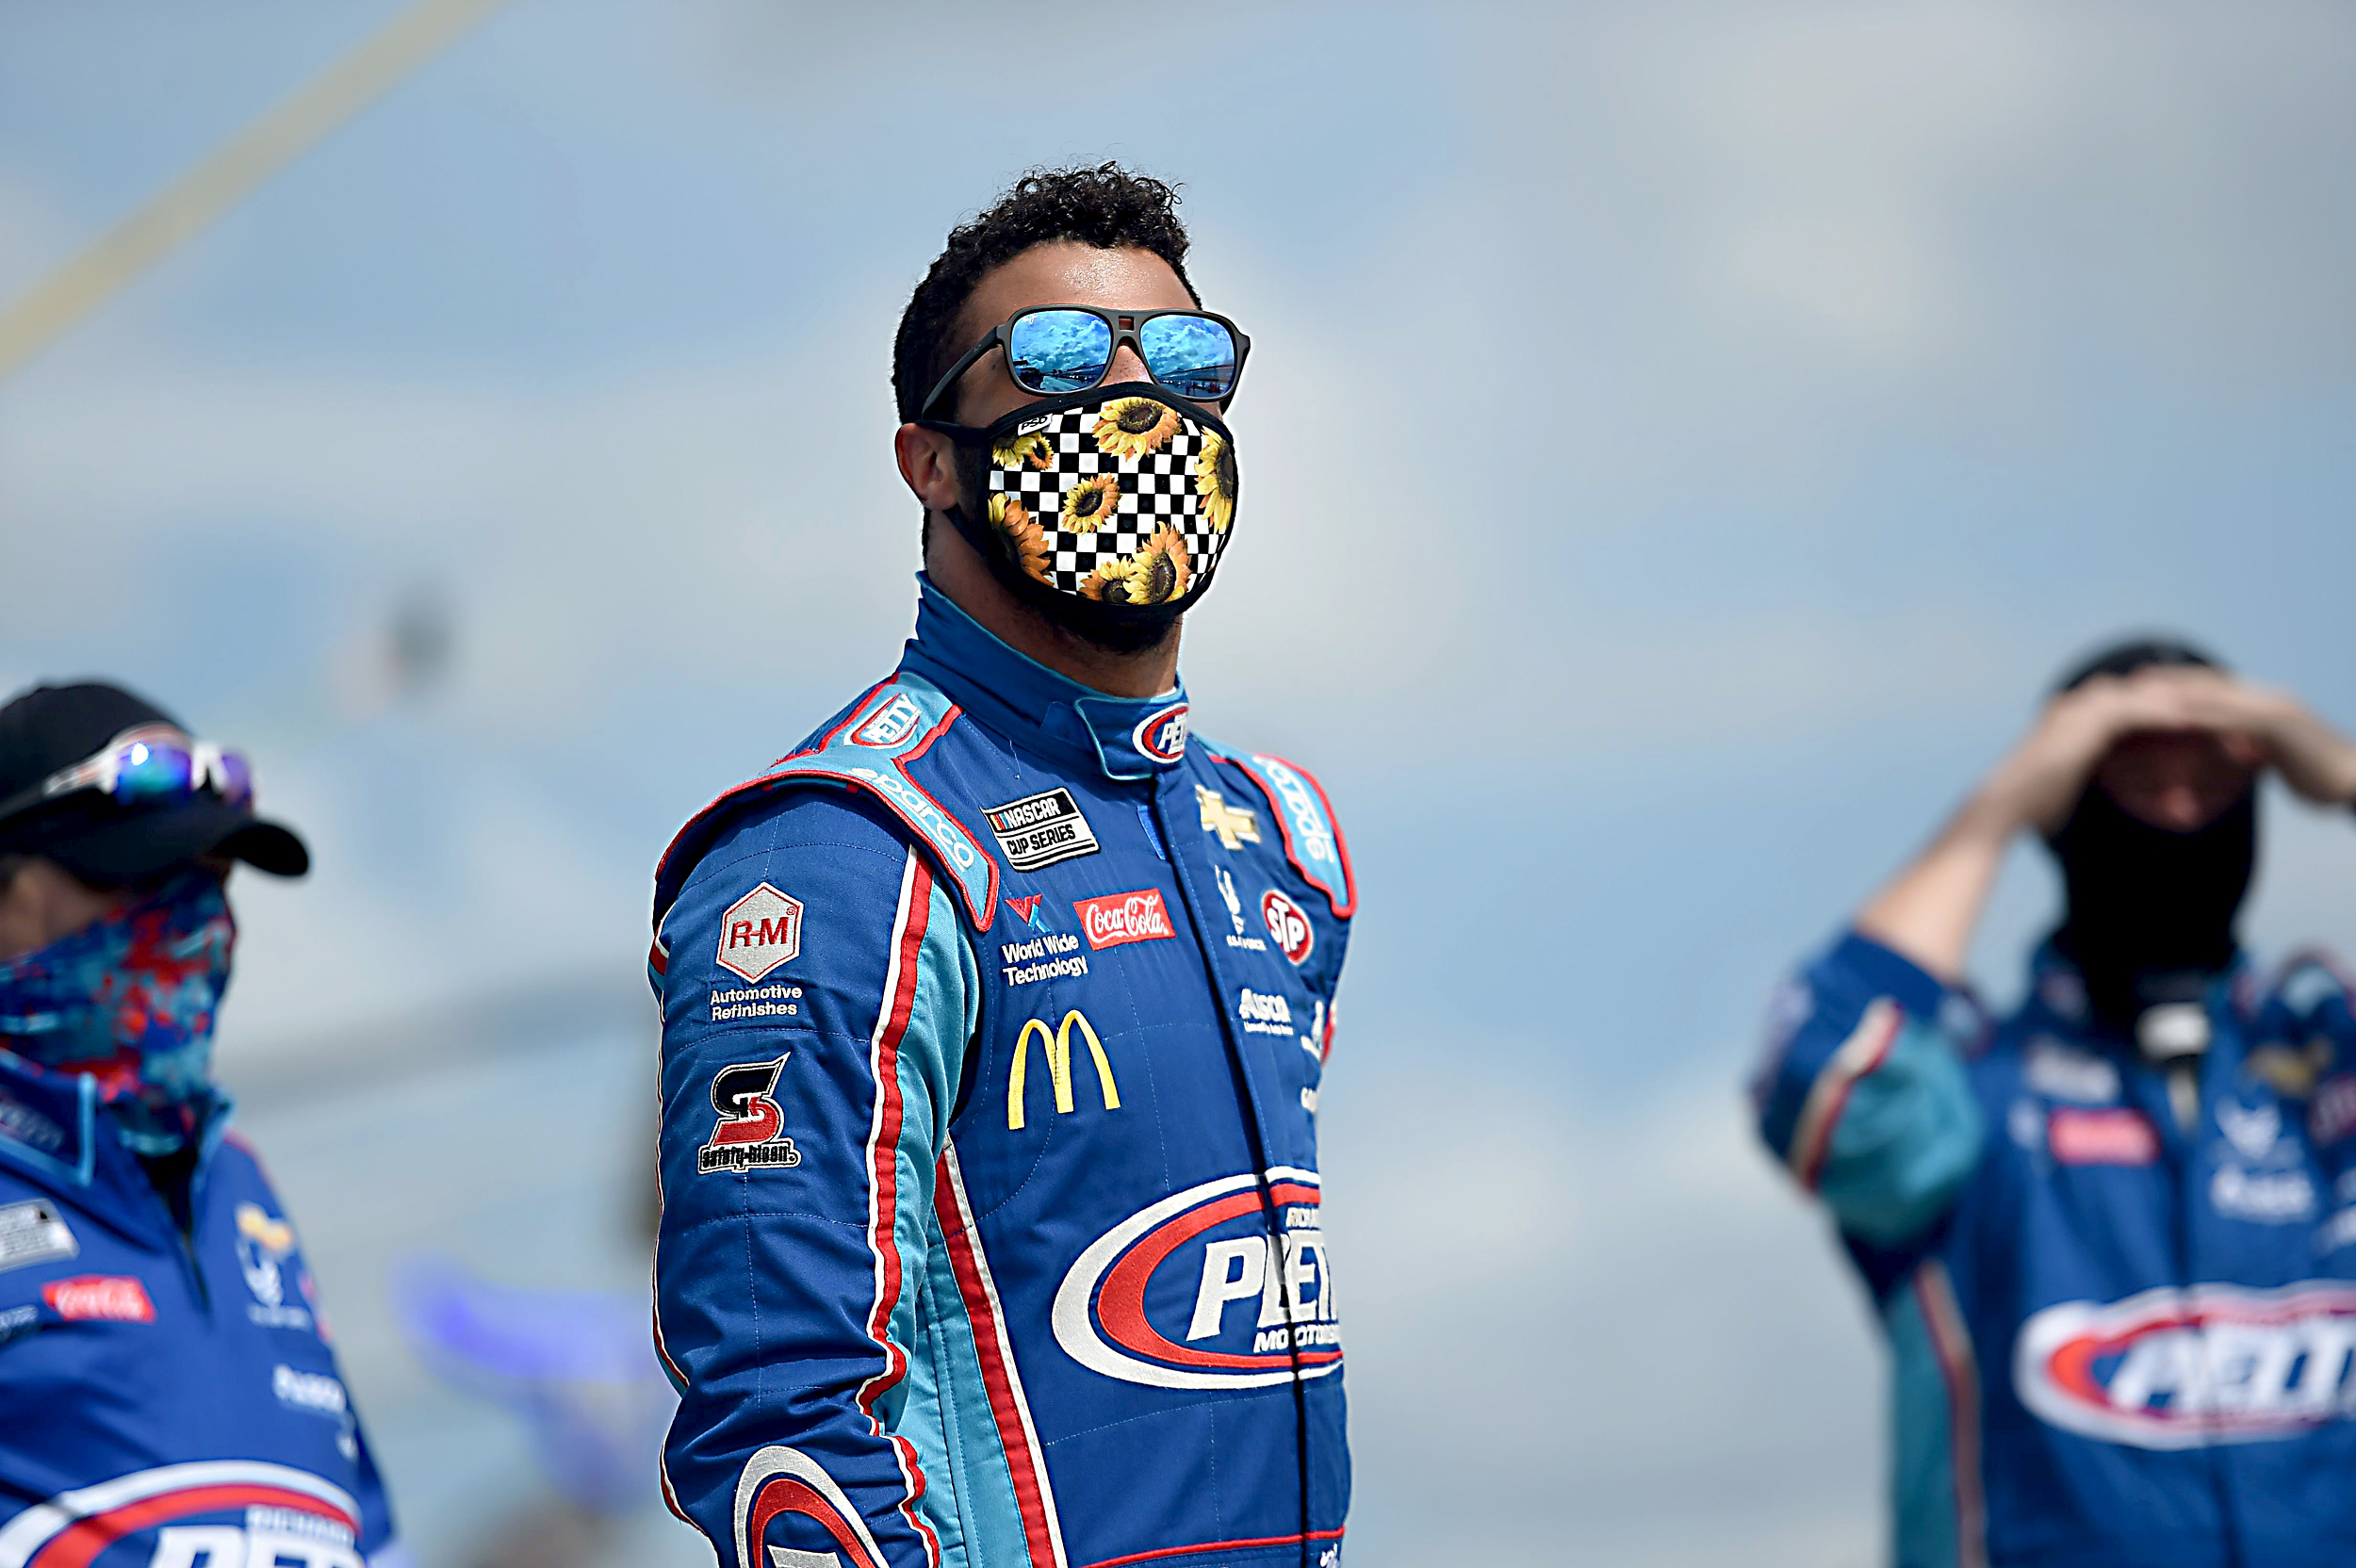 NASCAR is a rare sport that has found success navigating an era of upheaval